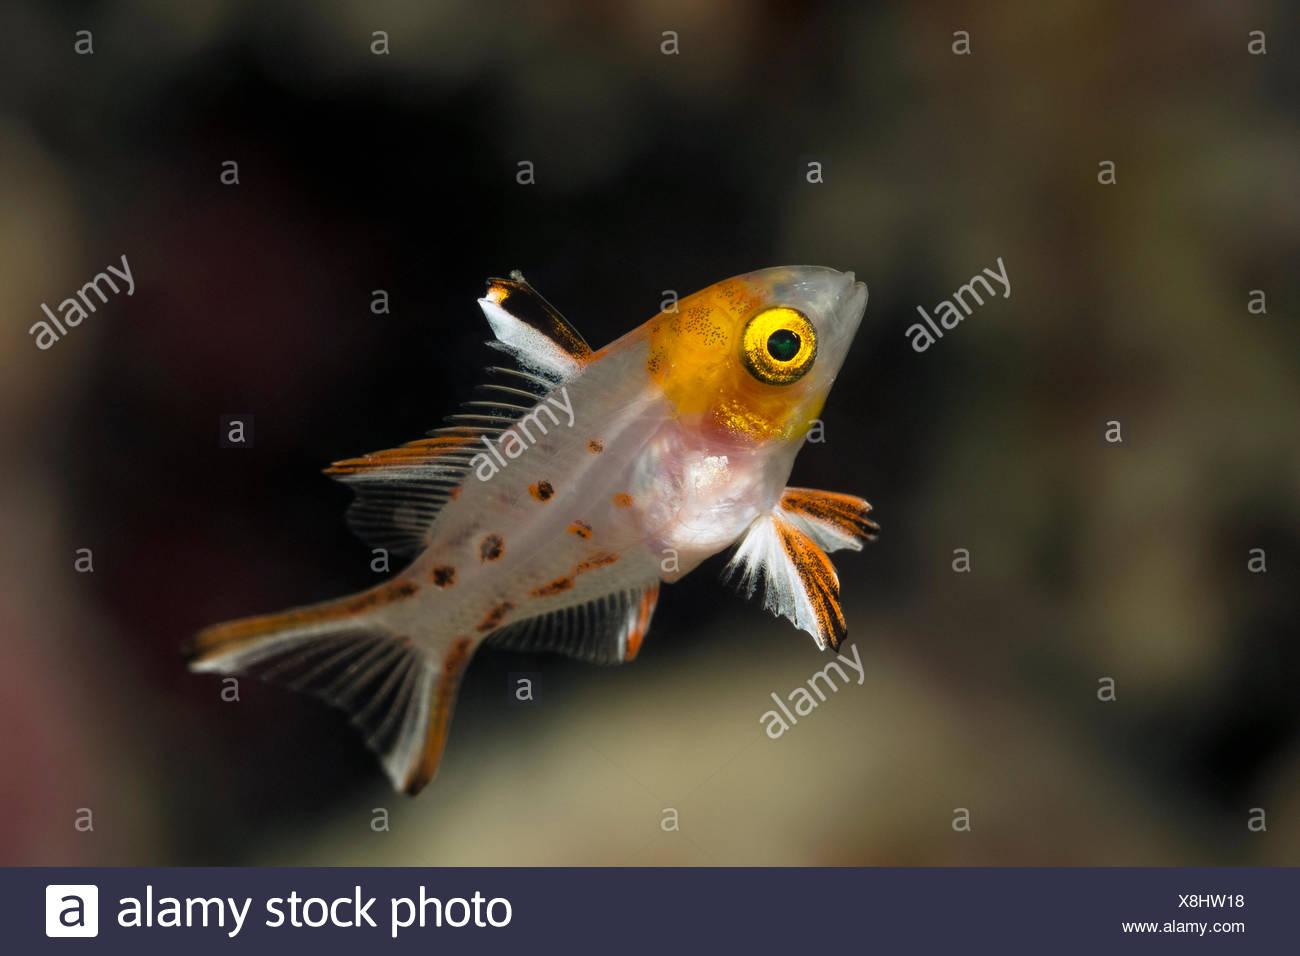 Juvenile Lyretail Hogfish, Bodianus anthioides, Marsa Alam, Red Sea, Egypt - Stock Image